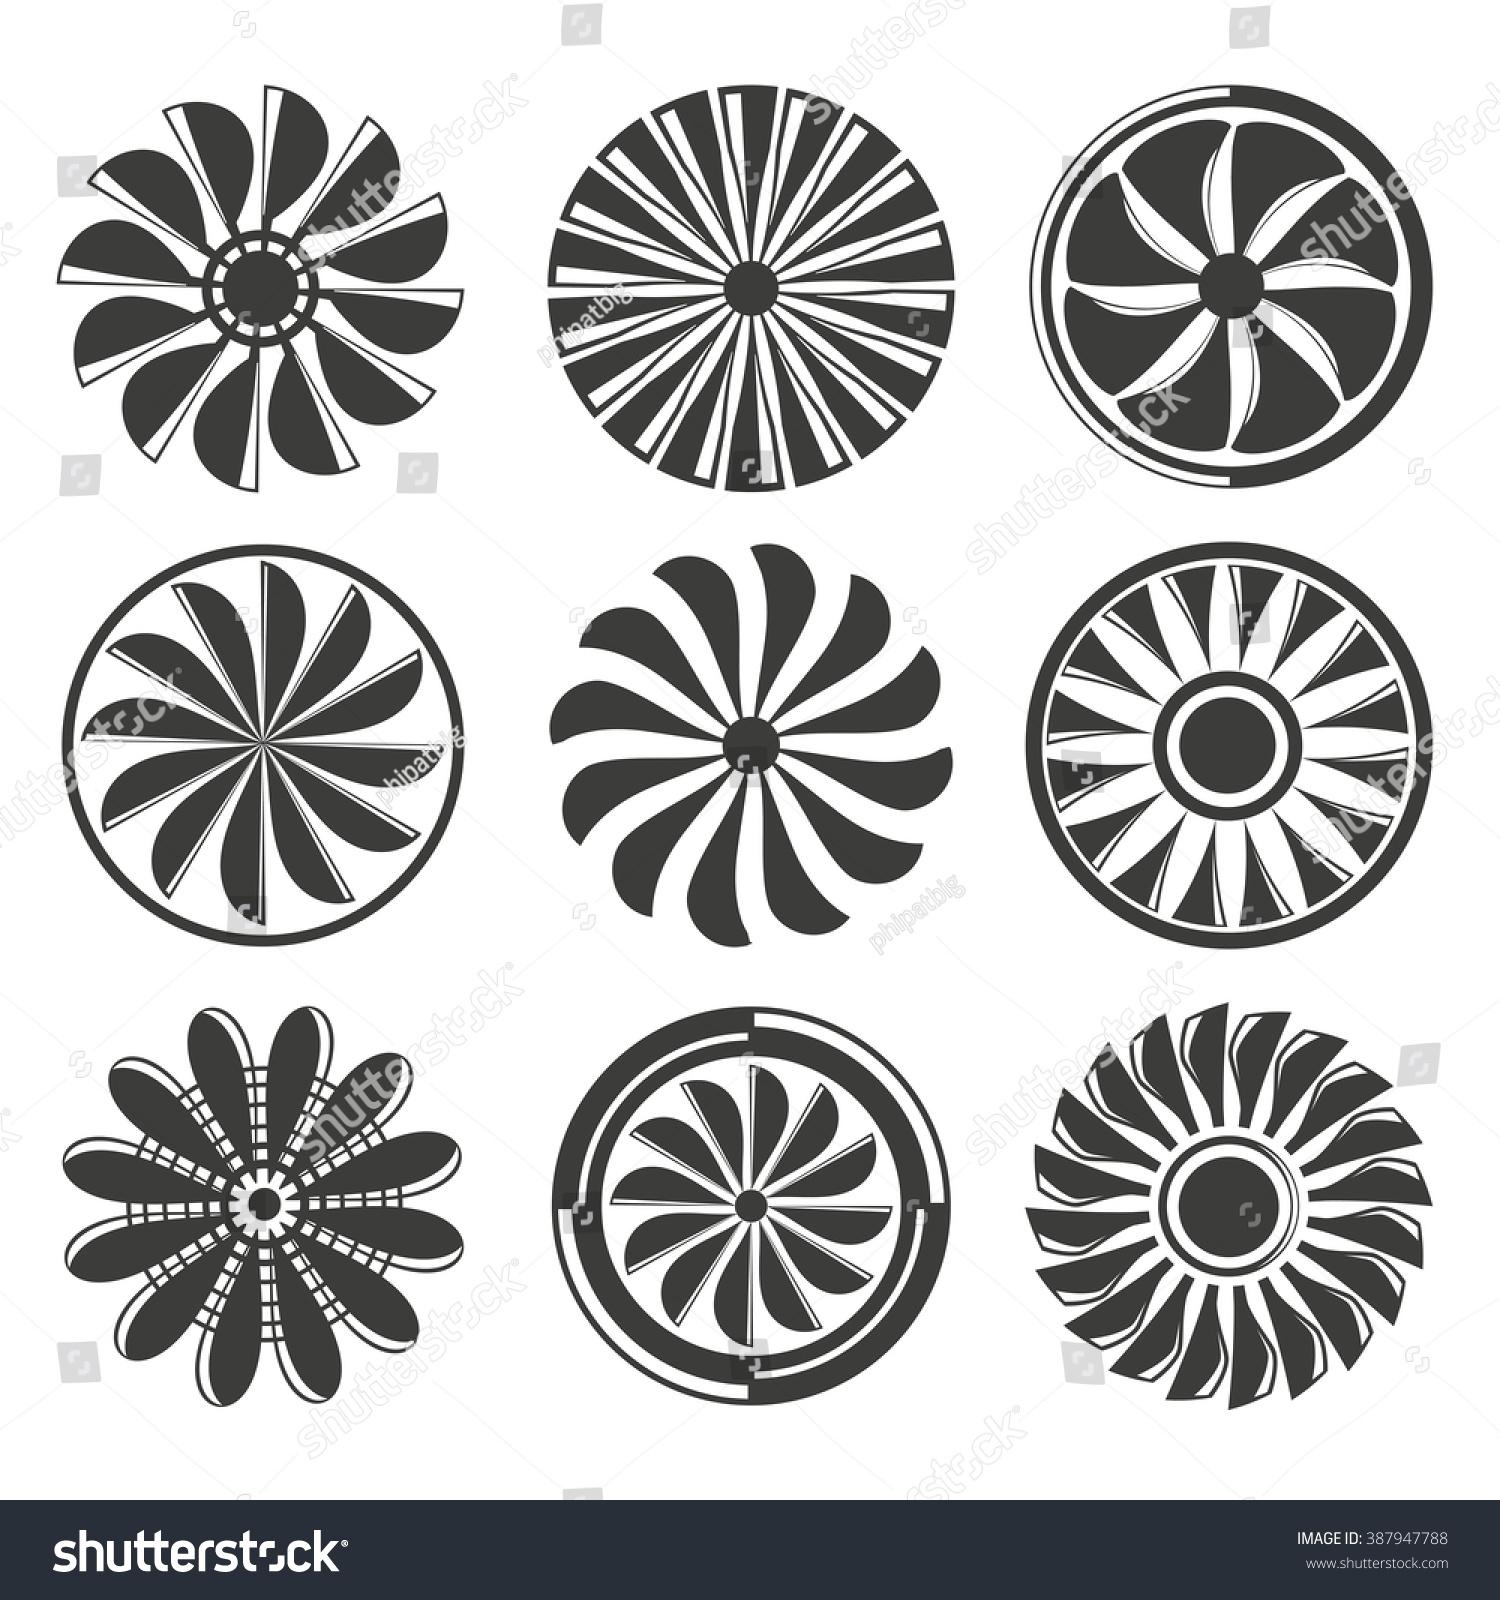 Fan Blade Outline : Jet engine icons set turbine stock vector